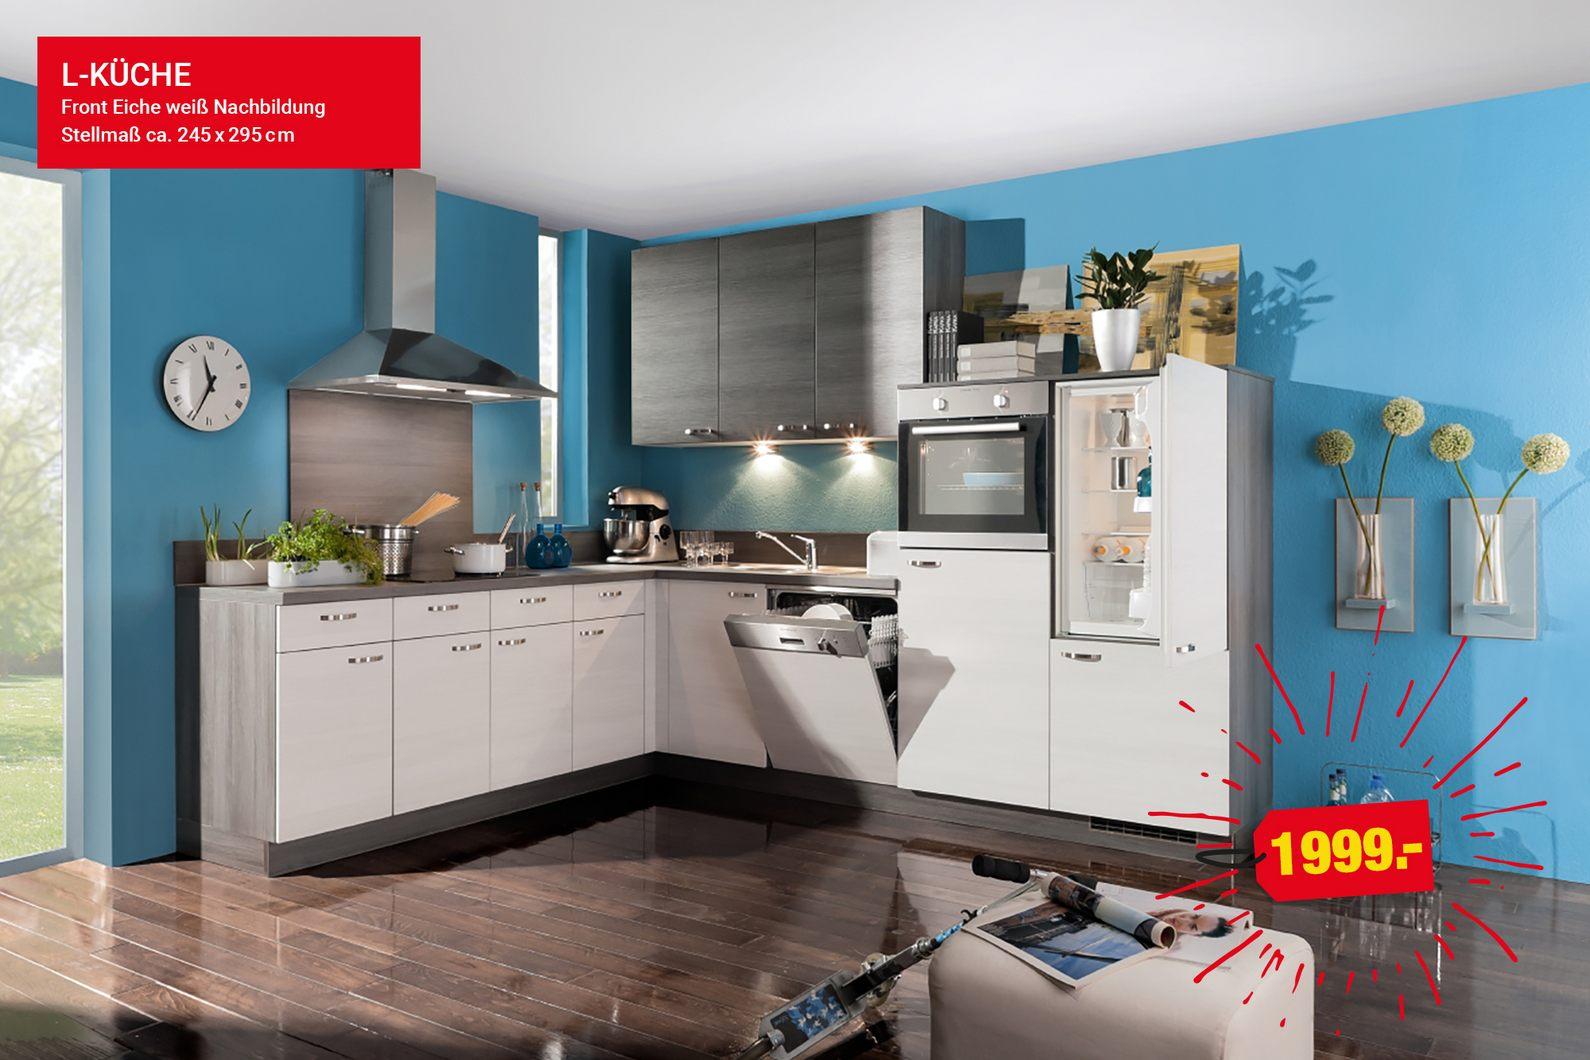 Full Size of Arbeitsplatte Küche Günstig Kaufen Einzeilige Küche Günstig Kaufen Küche Günstig Kaufen Erfahrungen Wandblende Küche Günstig Kaufen Küche Küche Günstig Kaufen